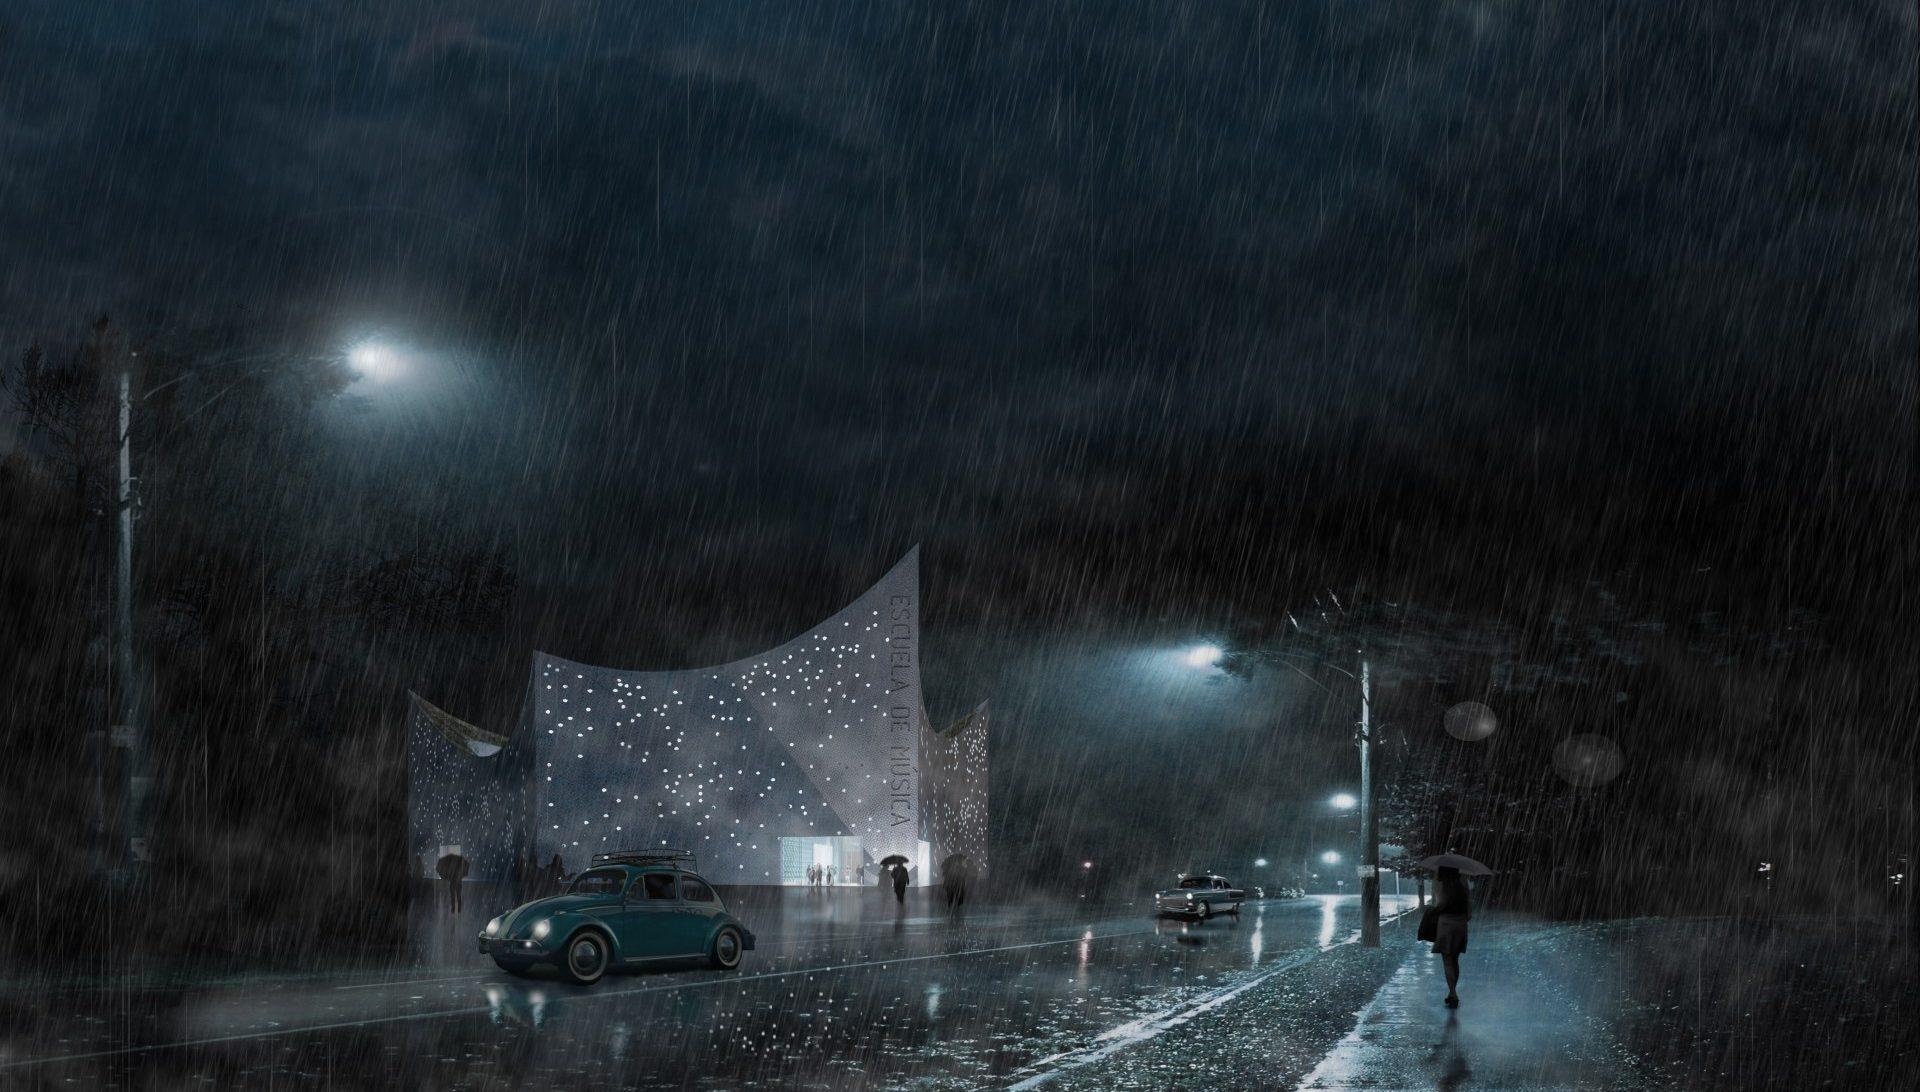 exterior_night_REVISITED 2020 _V3a